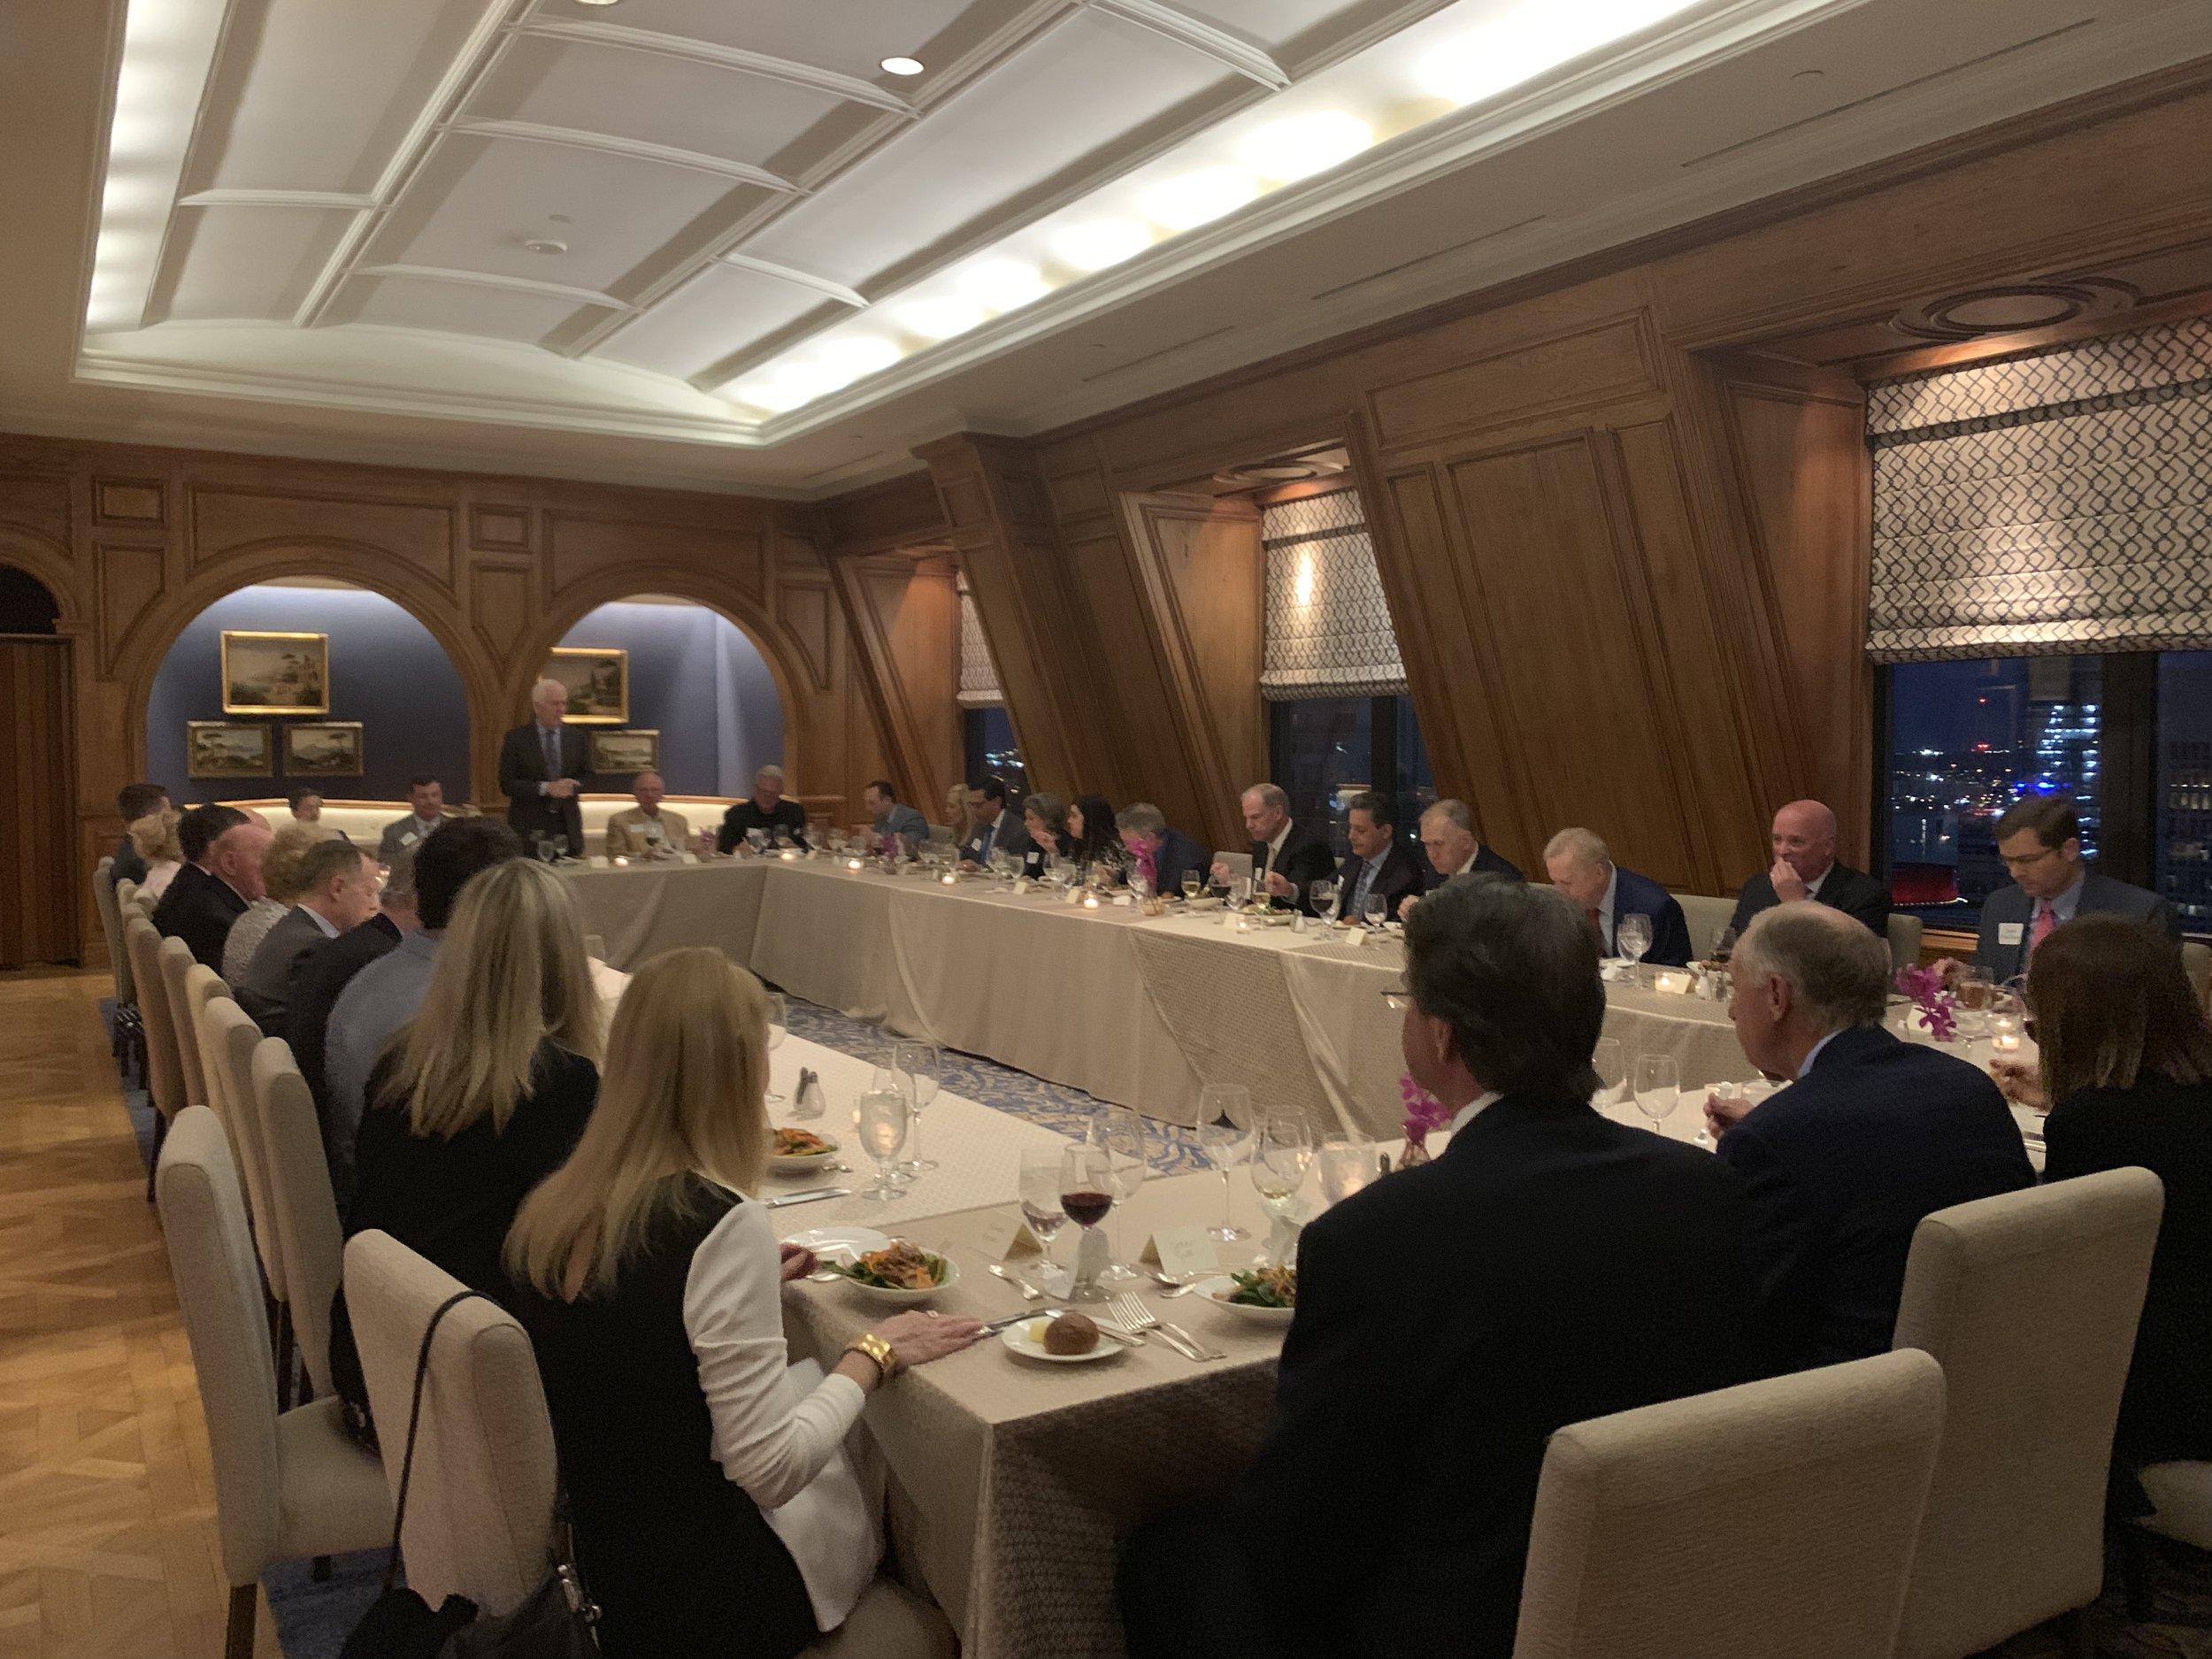 Senator John Cornyn speaks at the Senate Firewall 2020 dinner in 2019.